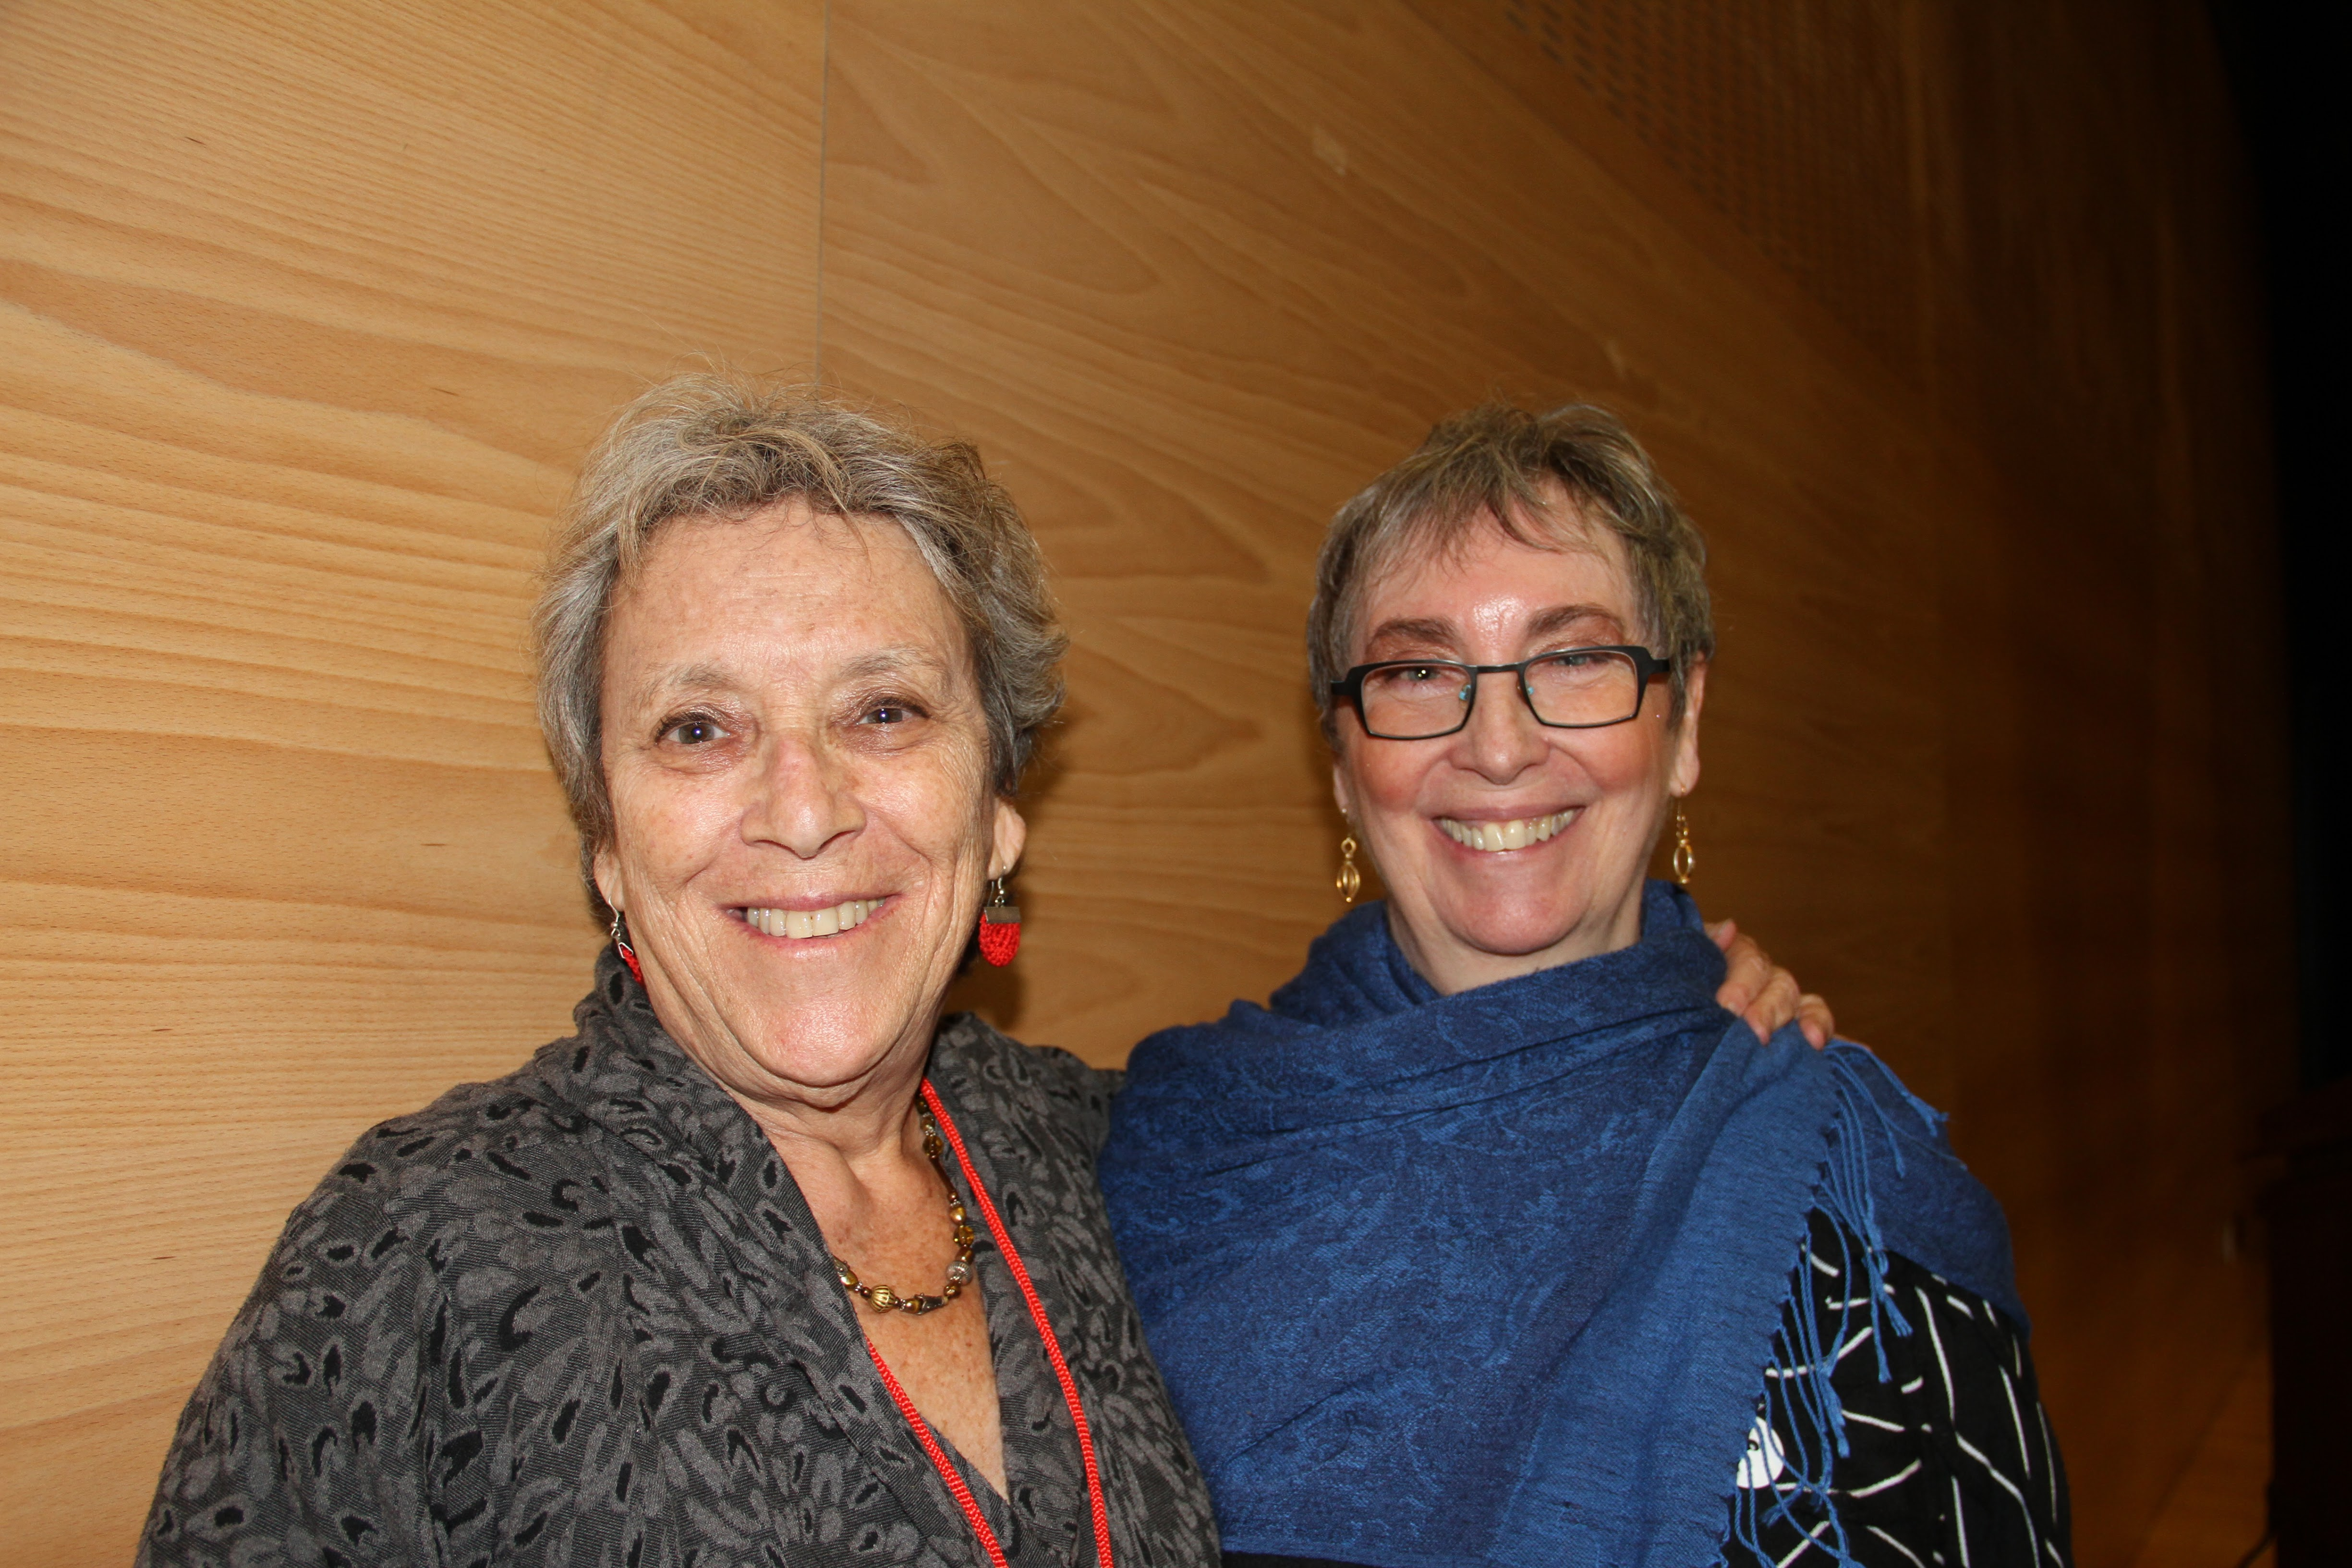 Betsy Grob (L) and Fretta Reitzes (R)